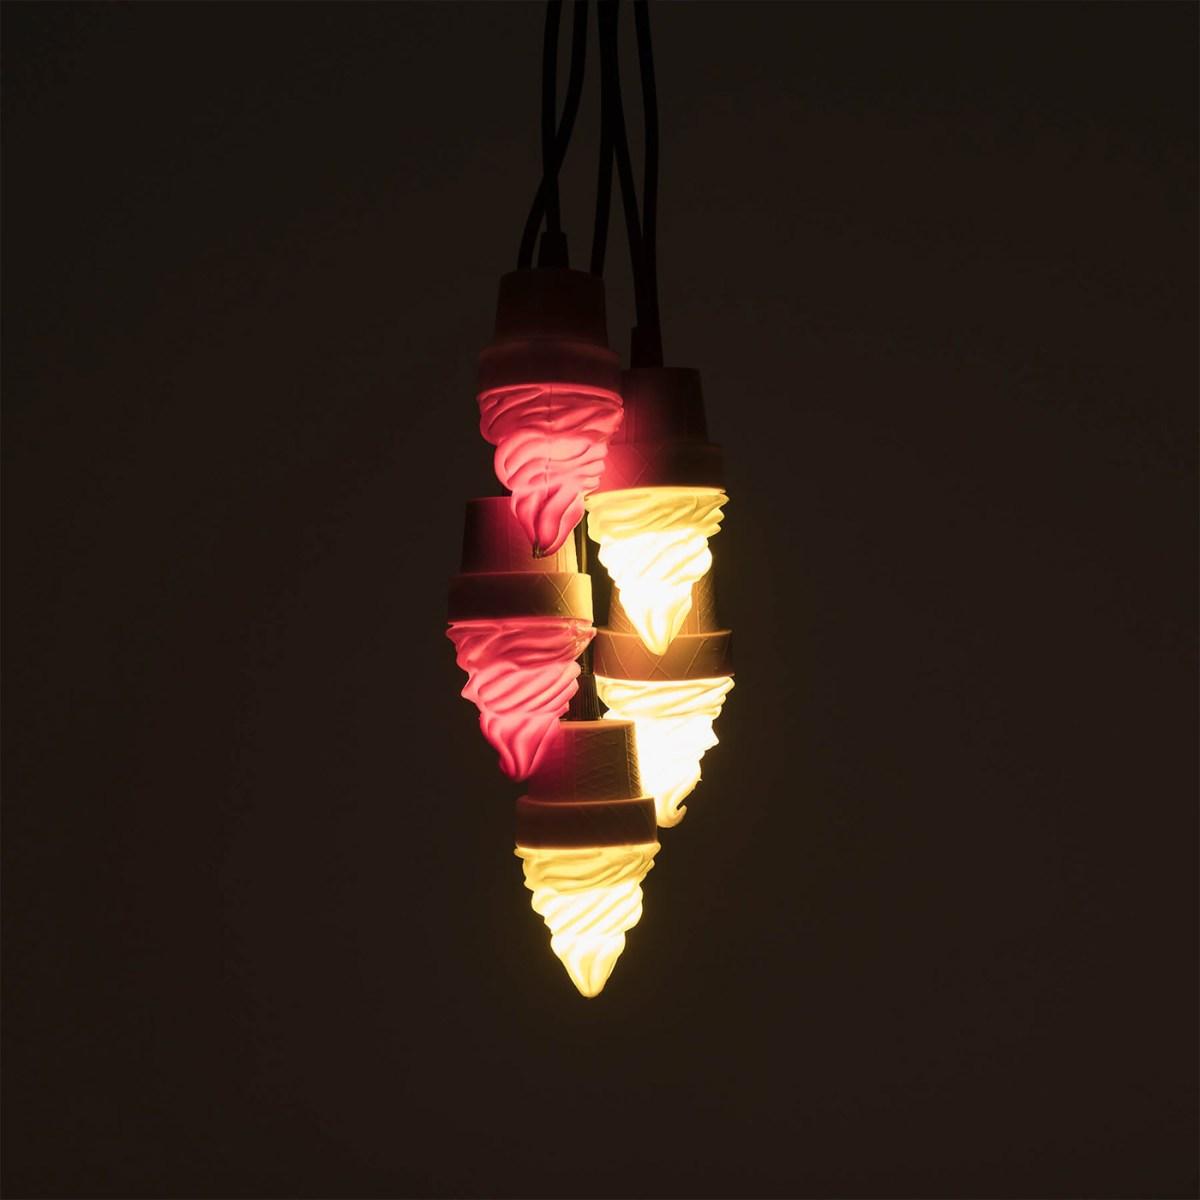 lighting-rrudi-09